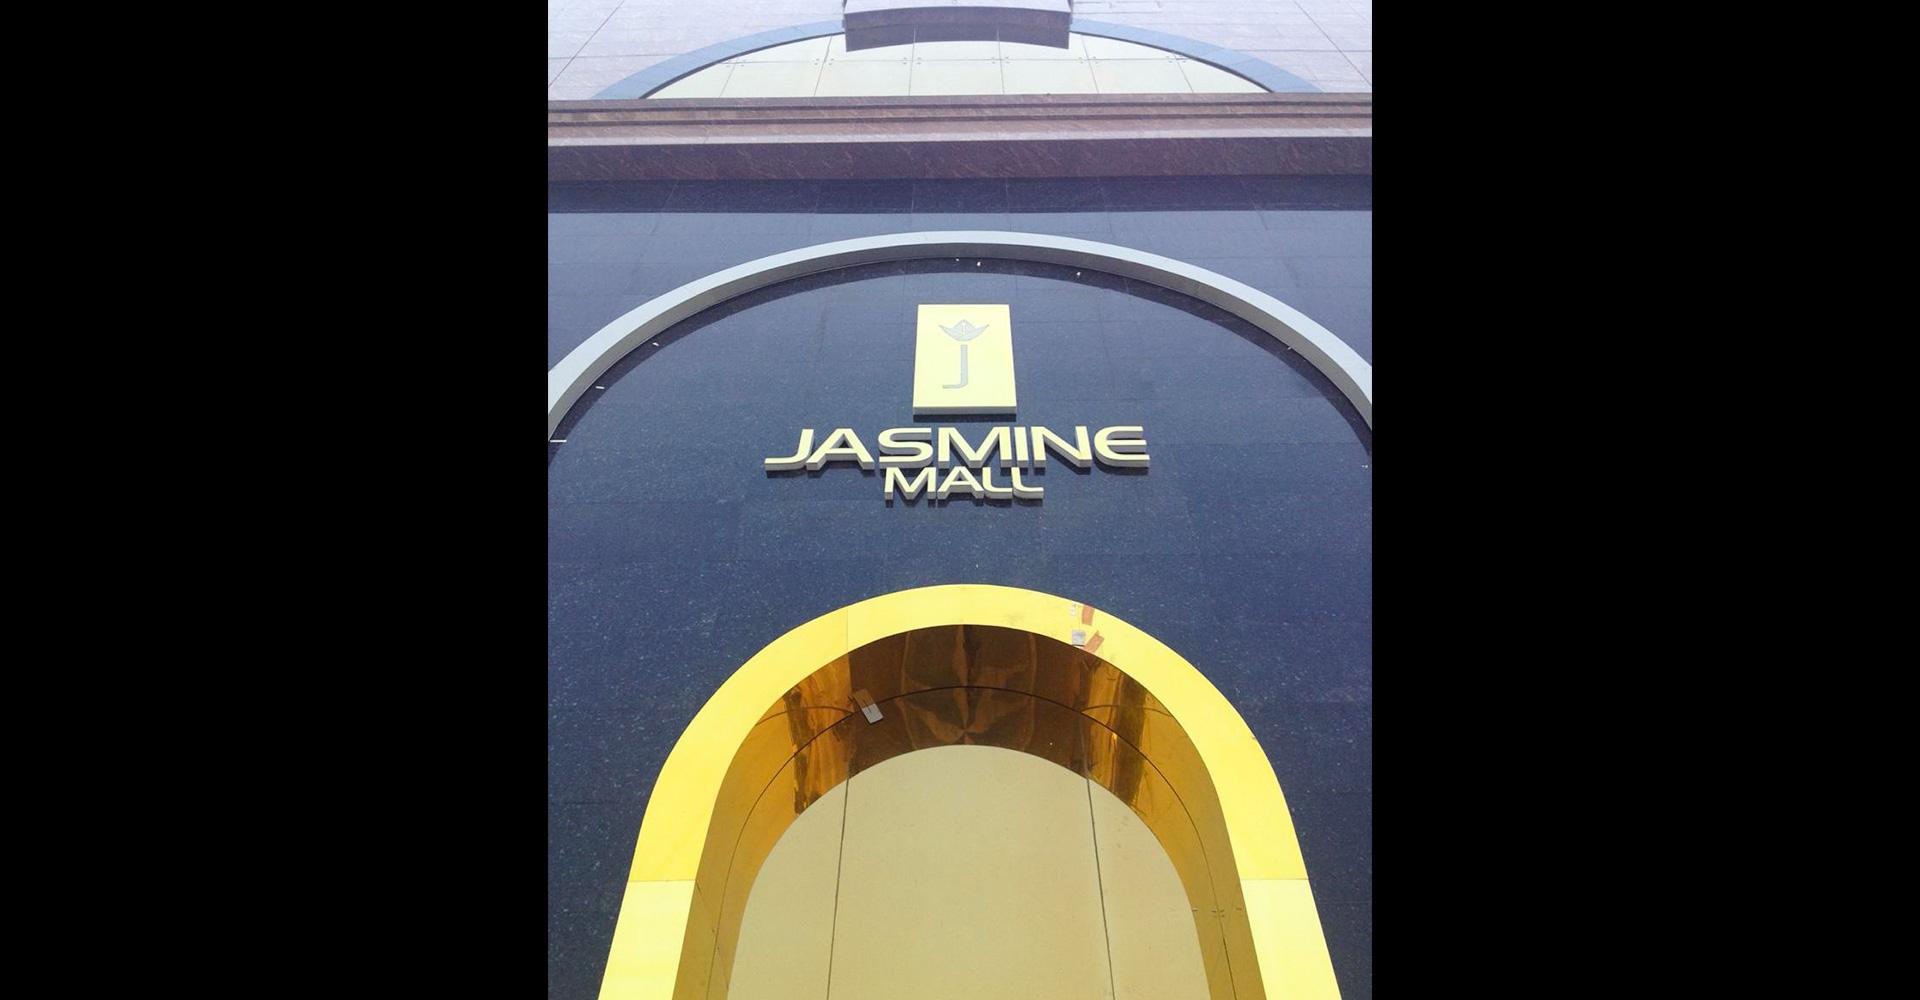 Building-Design-Hiline-Lahore-portfolio-Jasmine-Mall-Bahria-Town-02